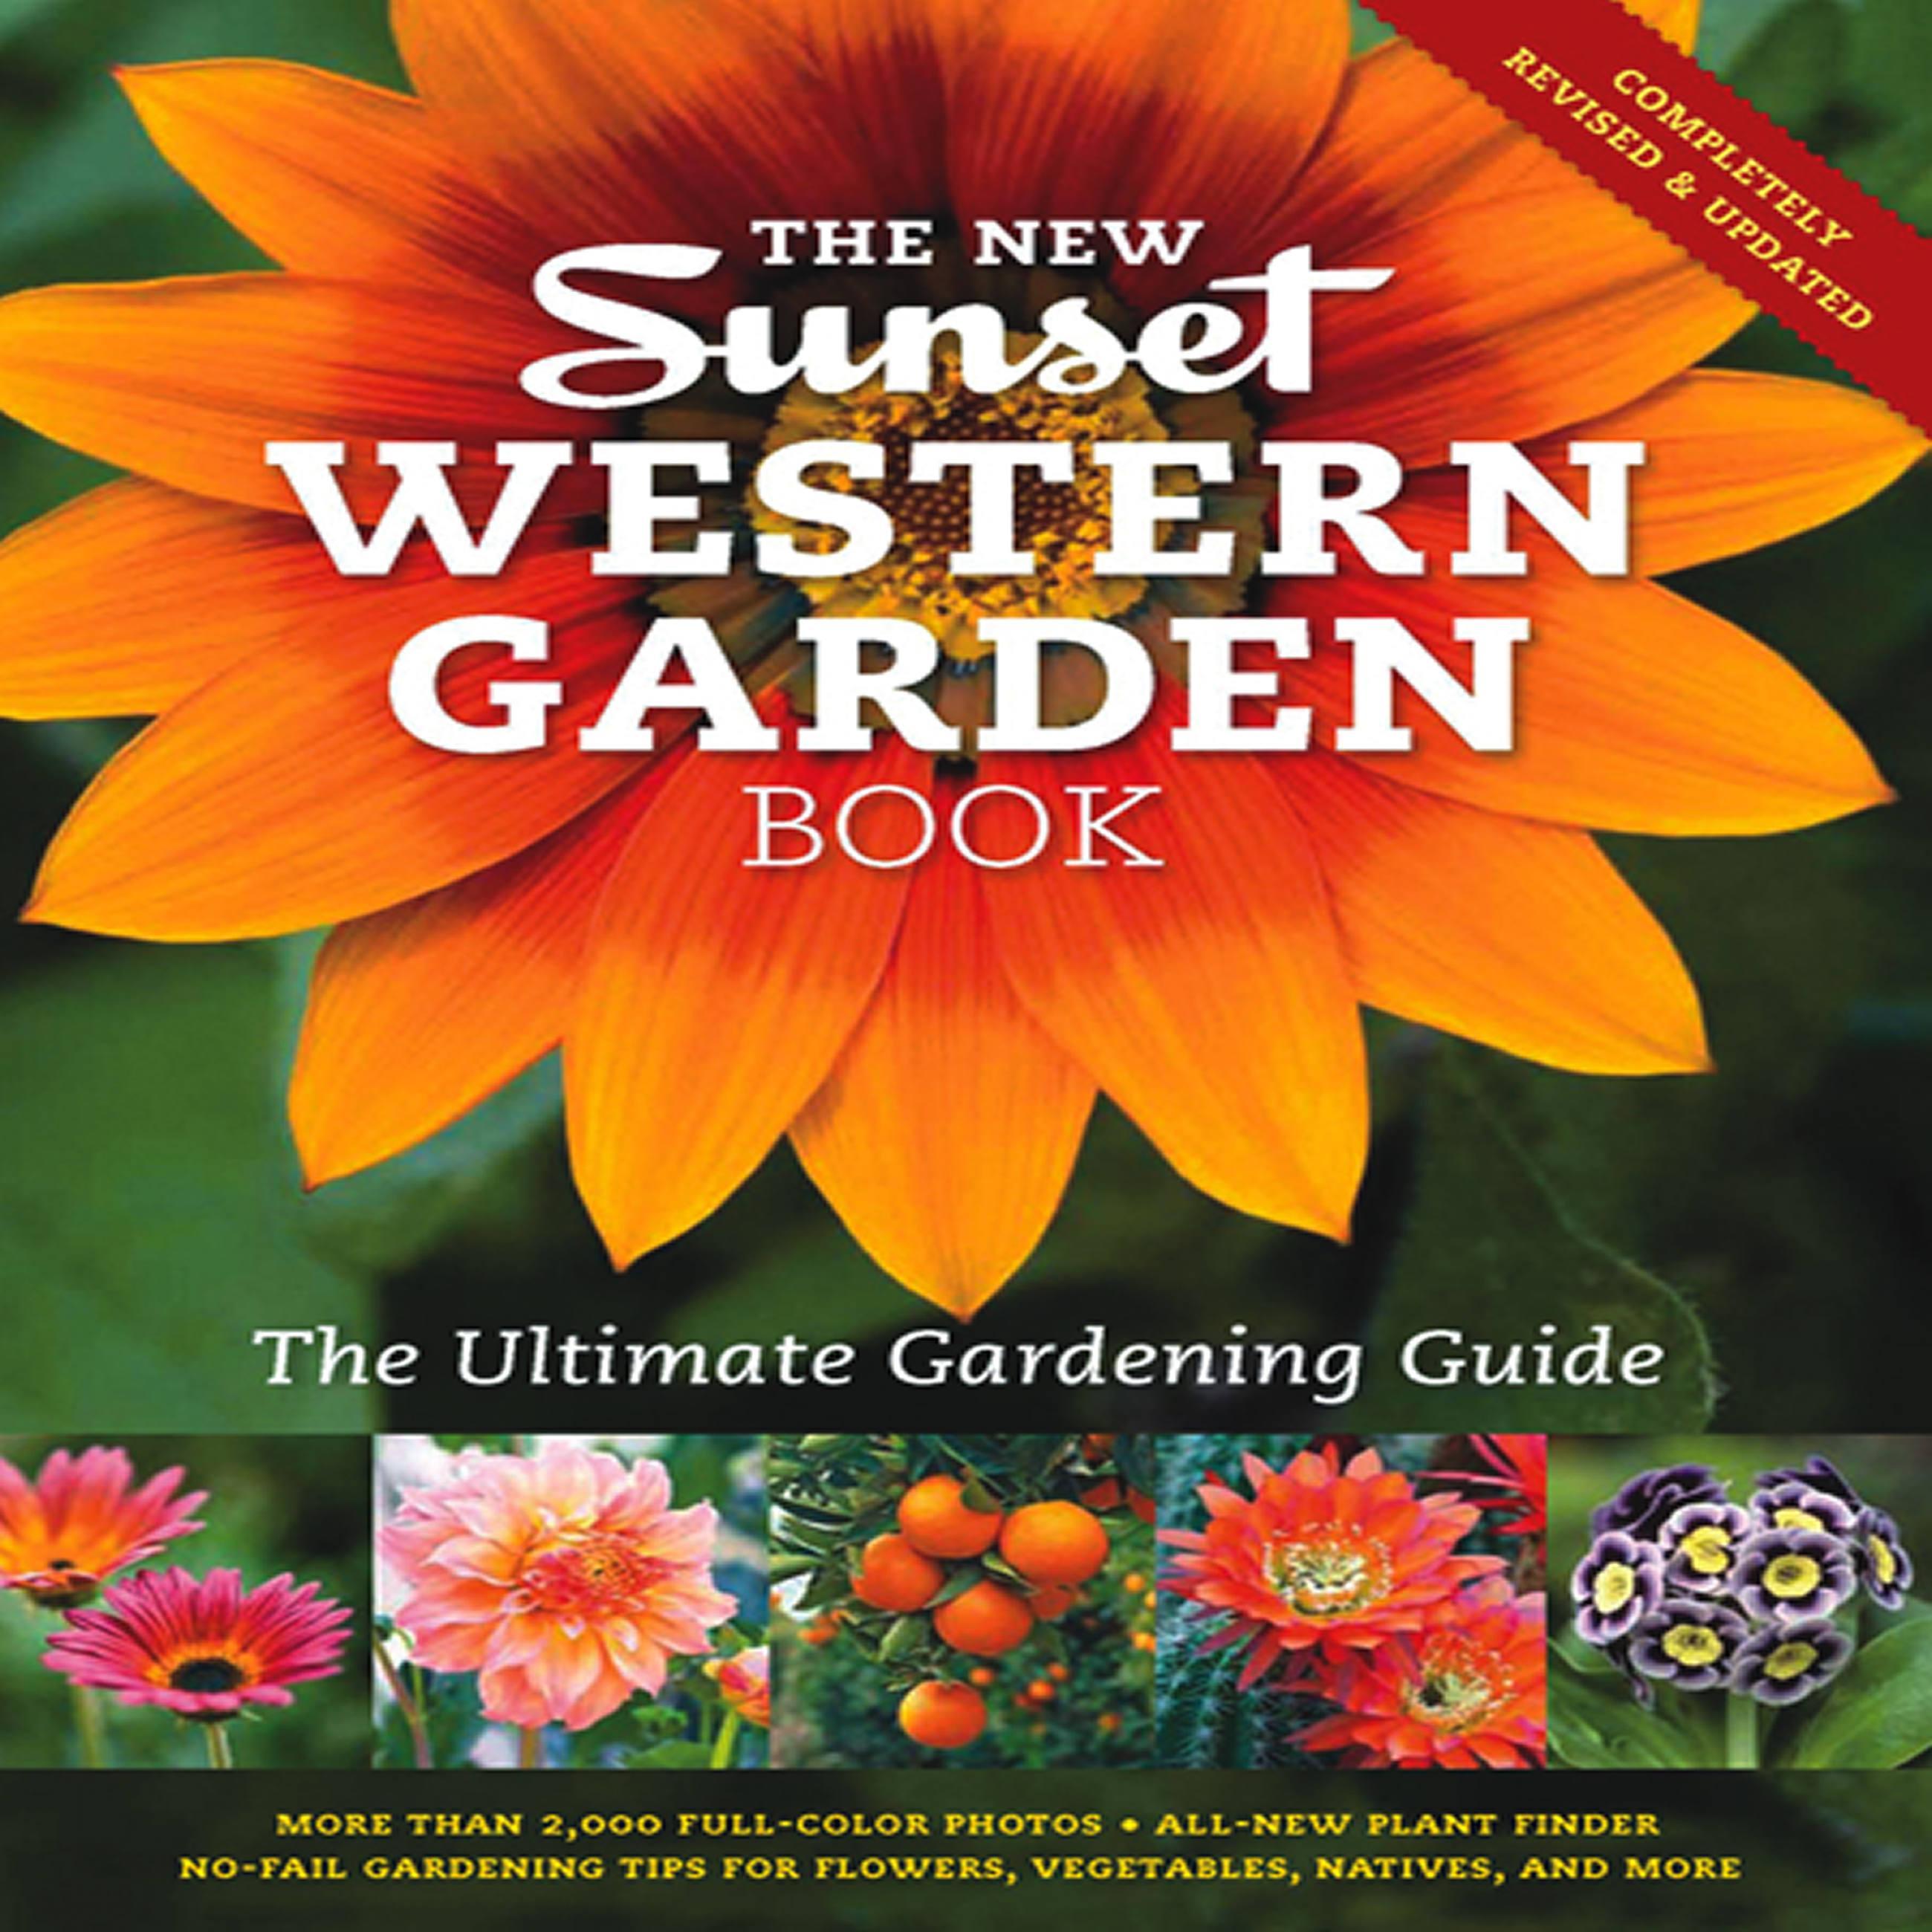 Sunset Western Garden Book (Paper): The New Sunset Western Garden Book (Paperback)